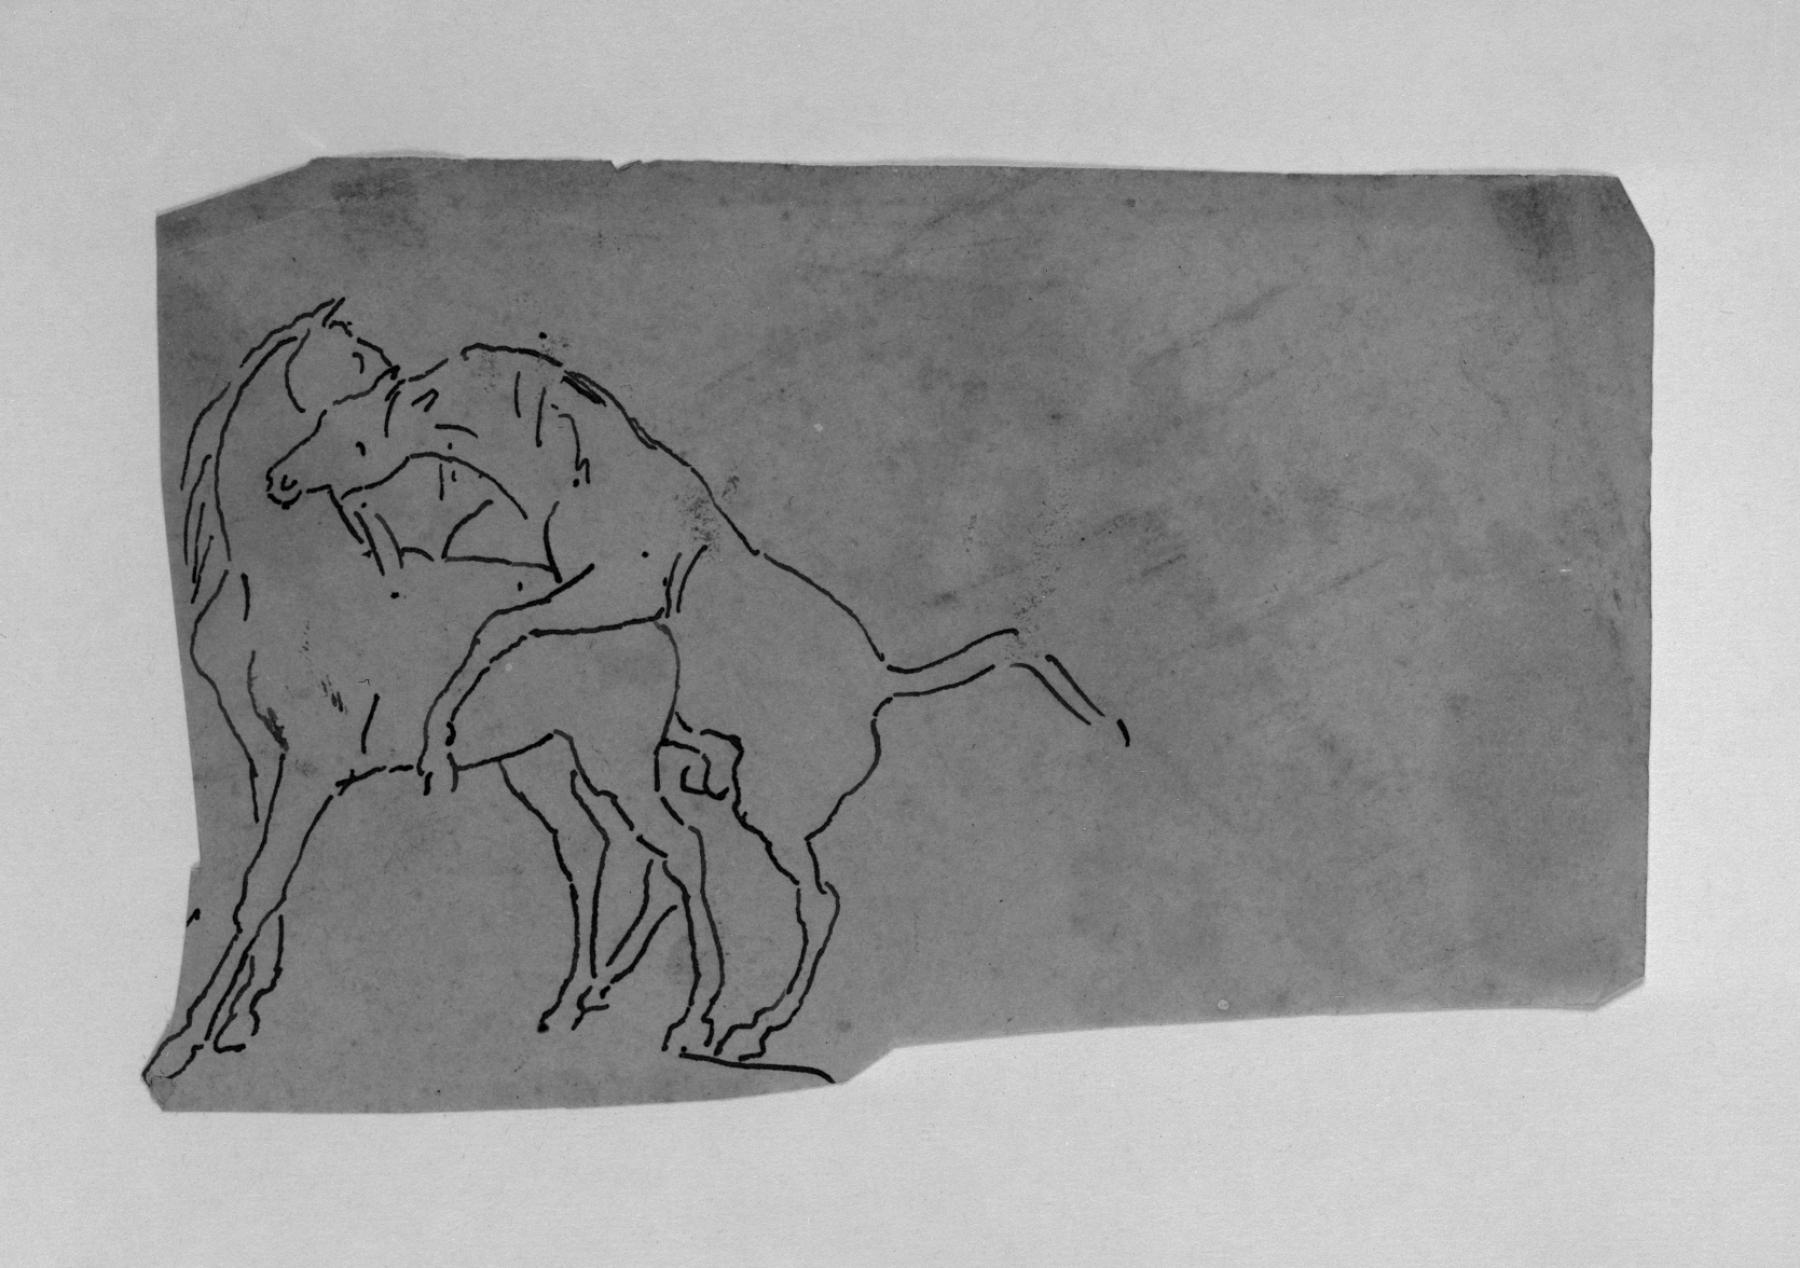 Antoine Louis Barye   Tracing of a Sketch of Horses Mating   Walters 372191 File:Antoine Louis Barye   Tracing of a Sketch of Horses Mating   Walters